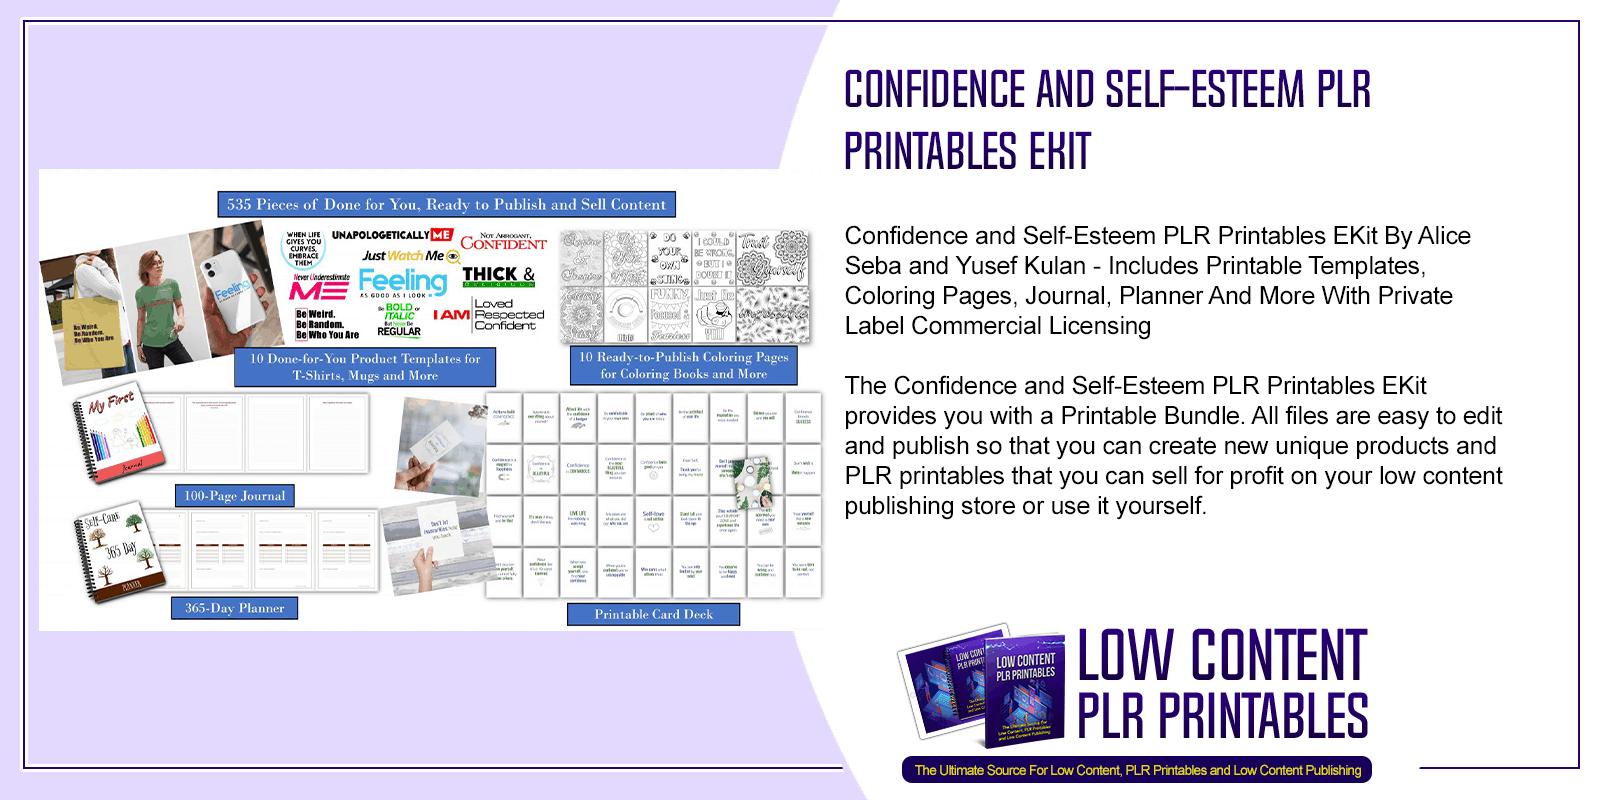 Confidence and Self Esteem PLR Printables EKit